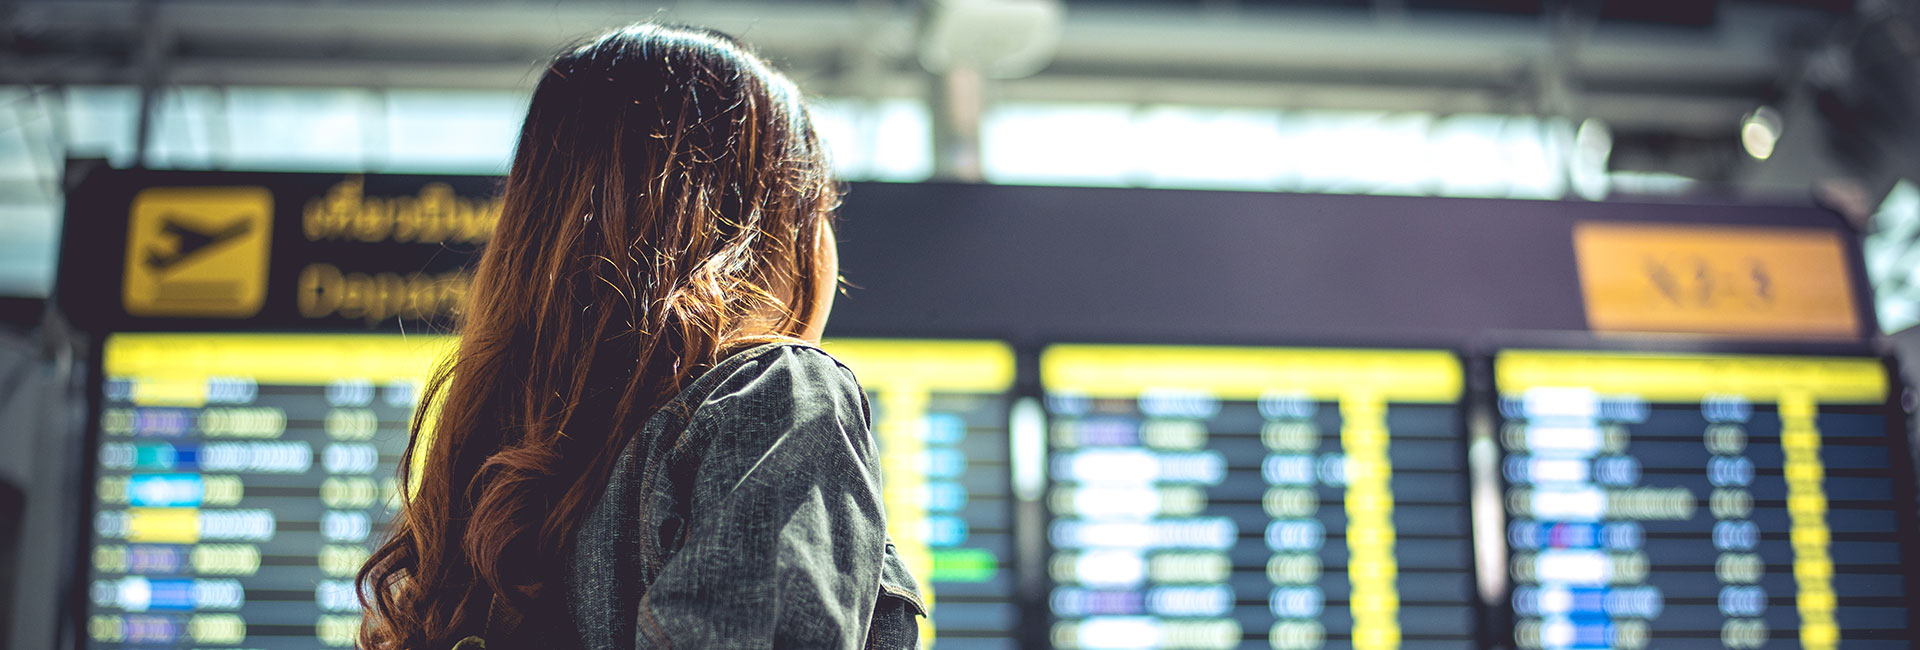 Flights schedule